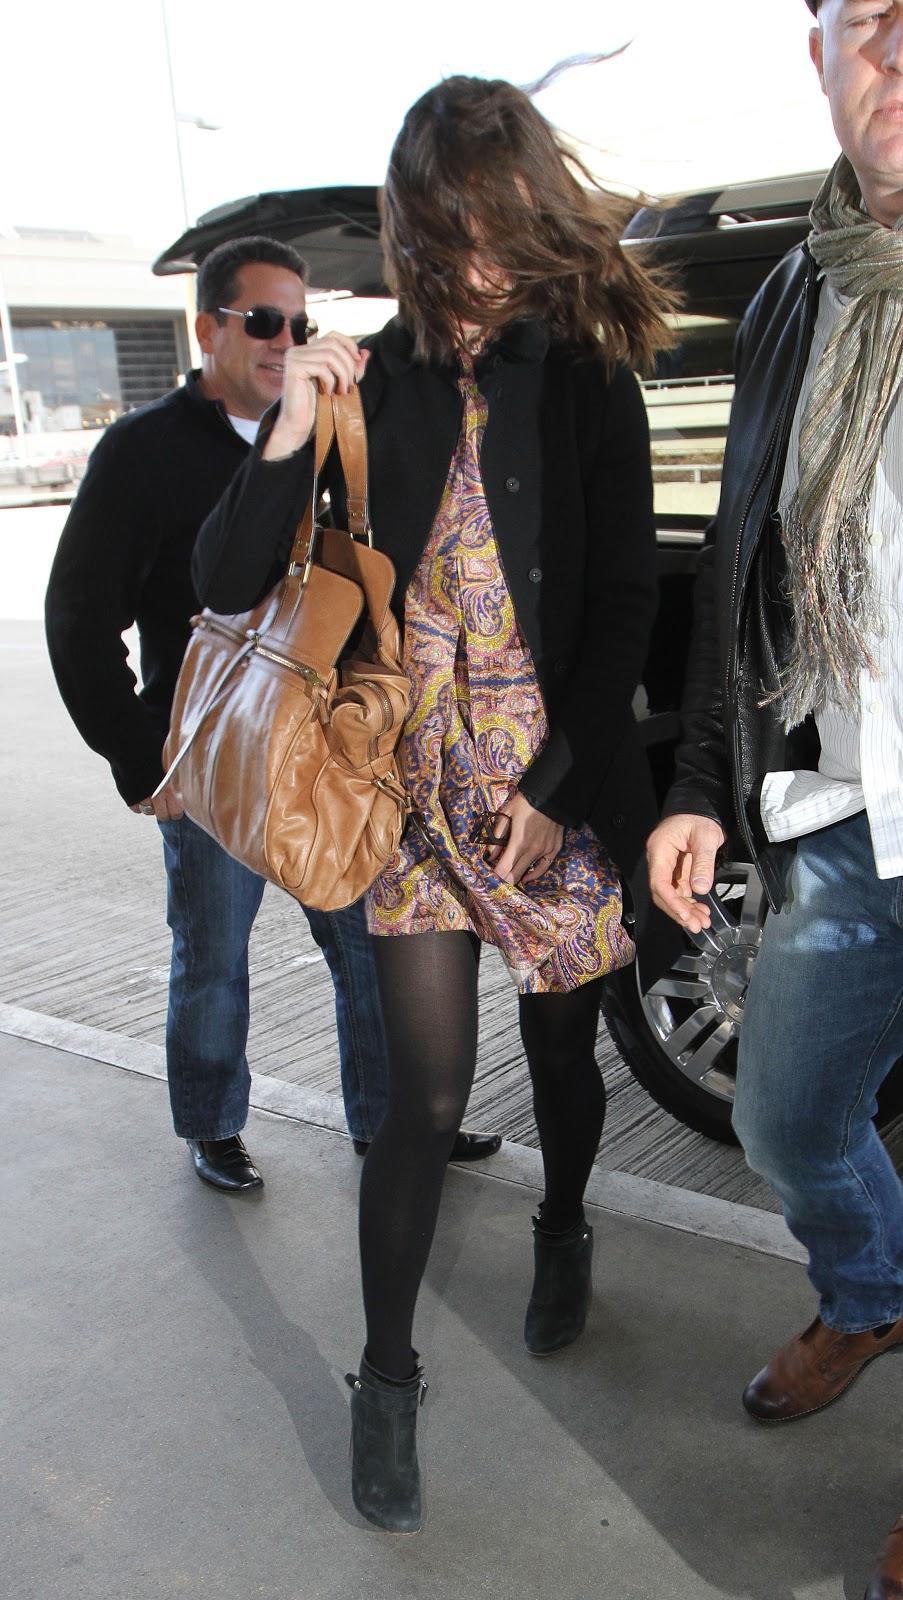 Lax airport november 1st celebrity